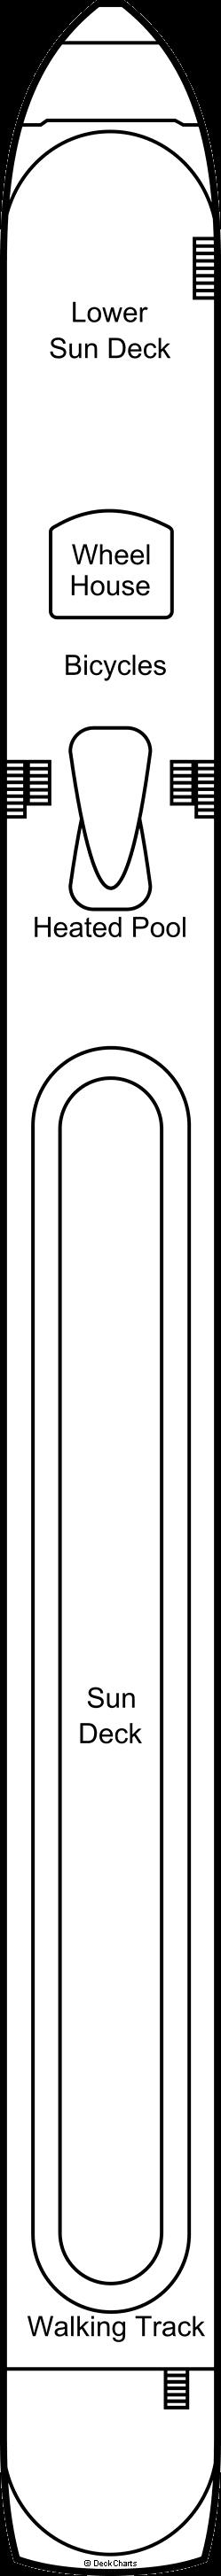 AmaKristina: Sun Deck